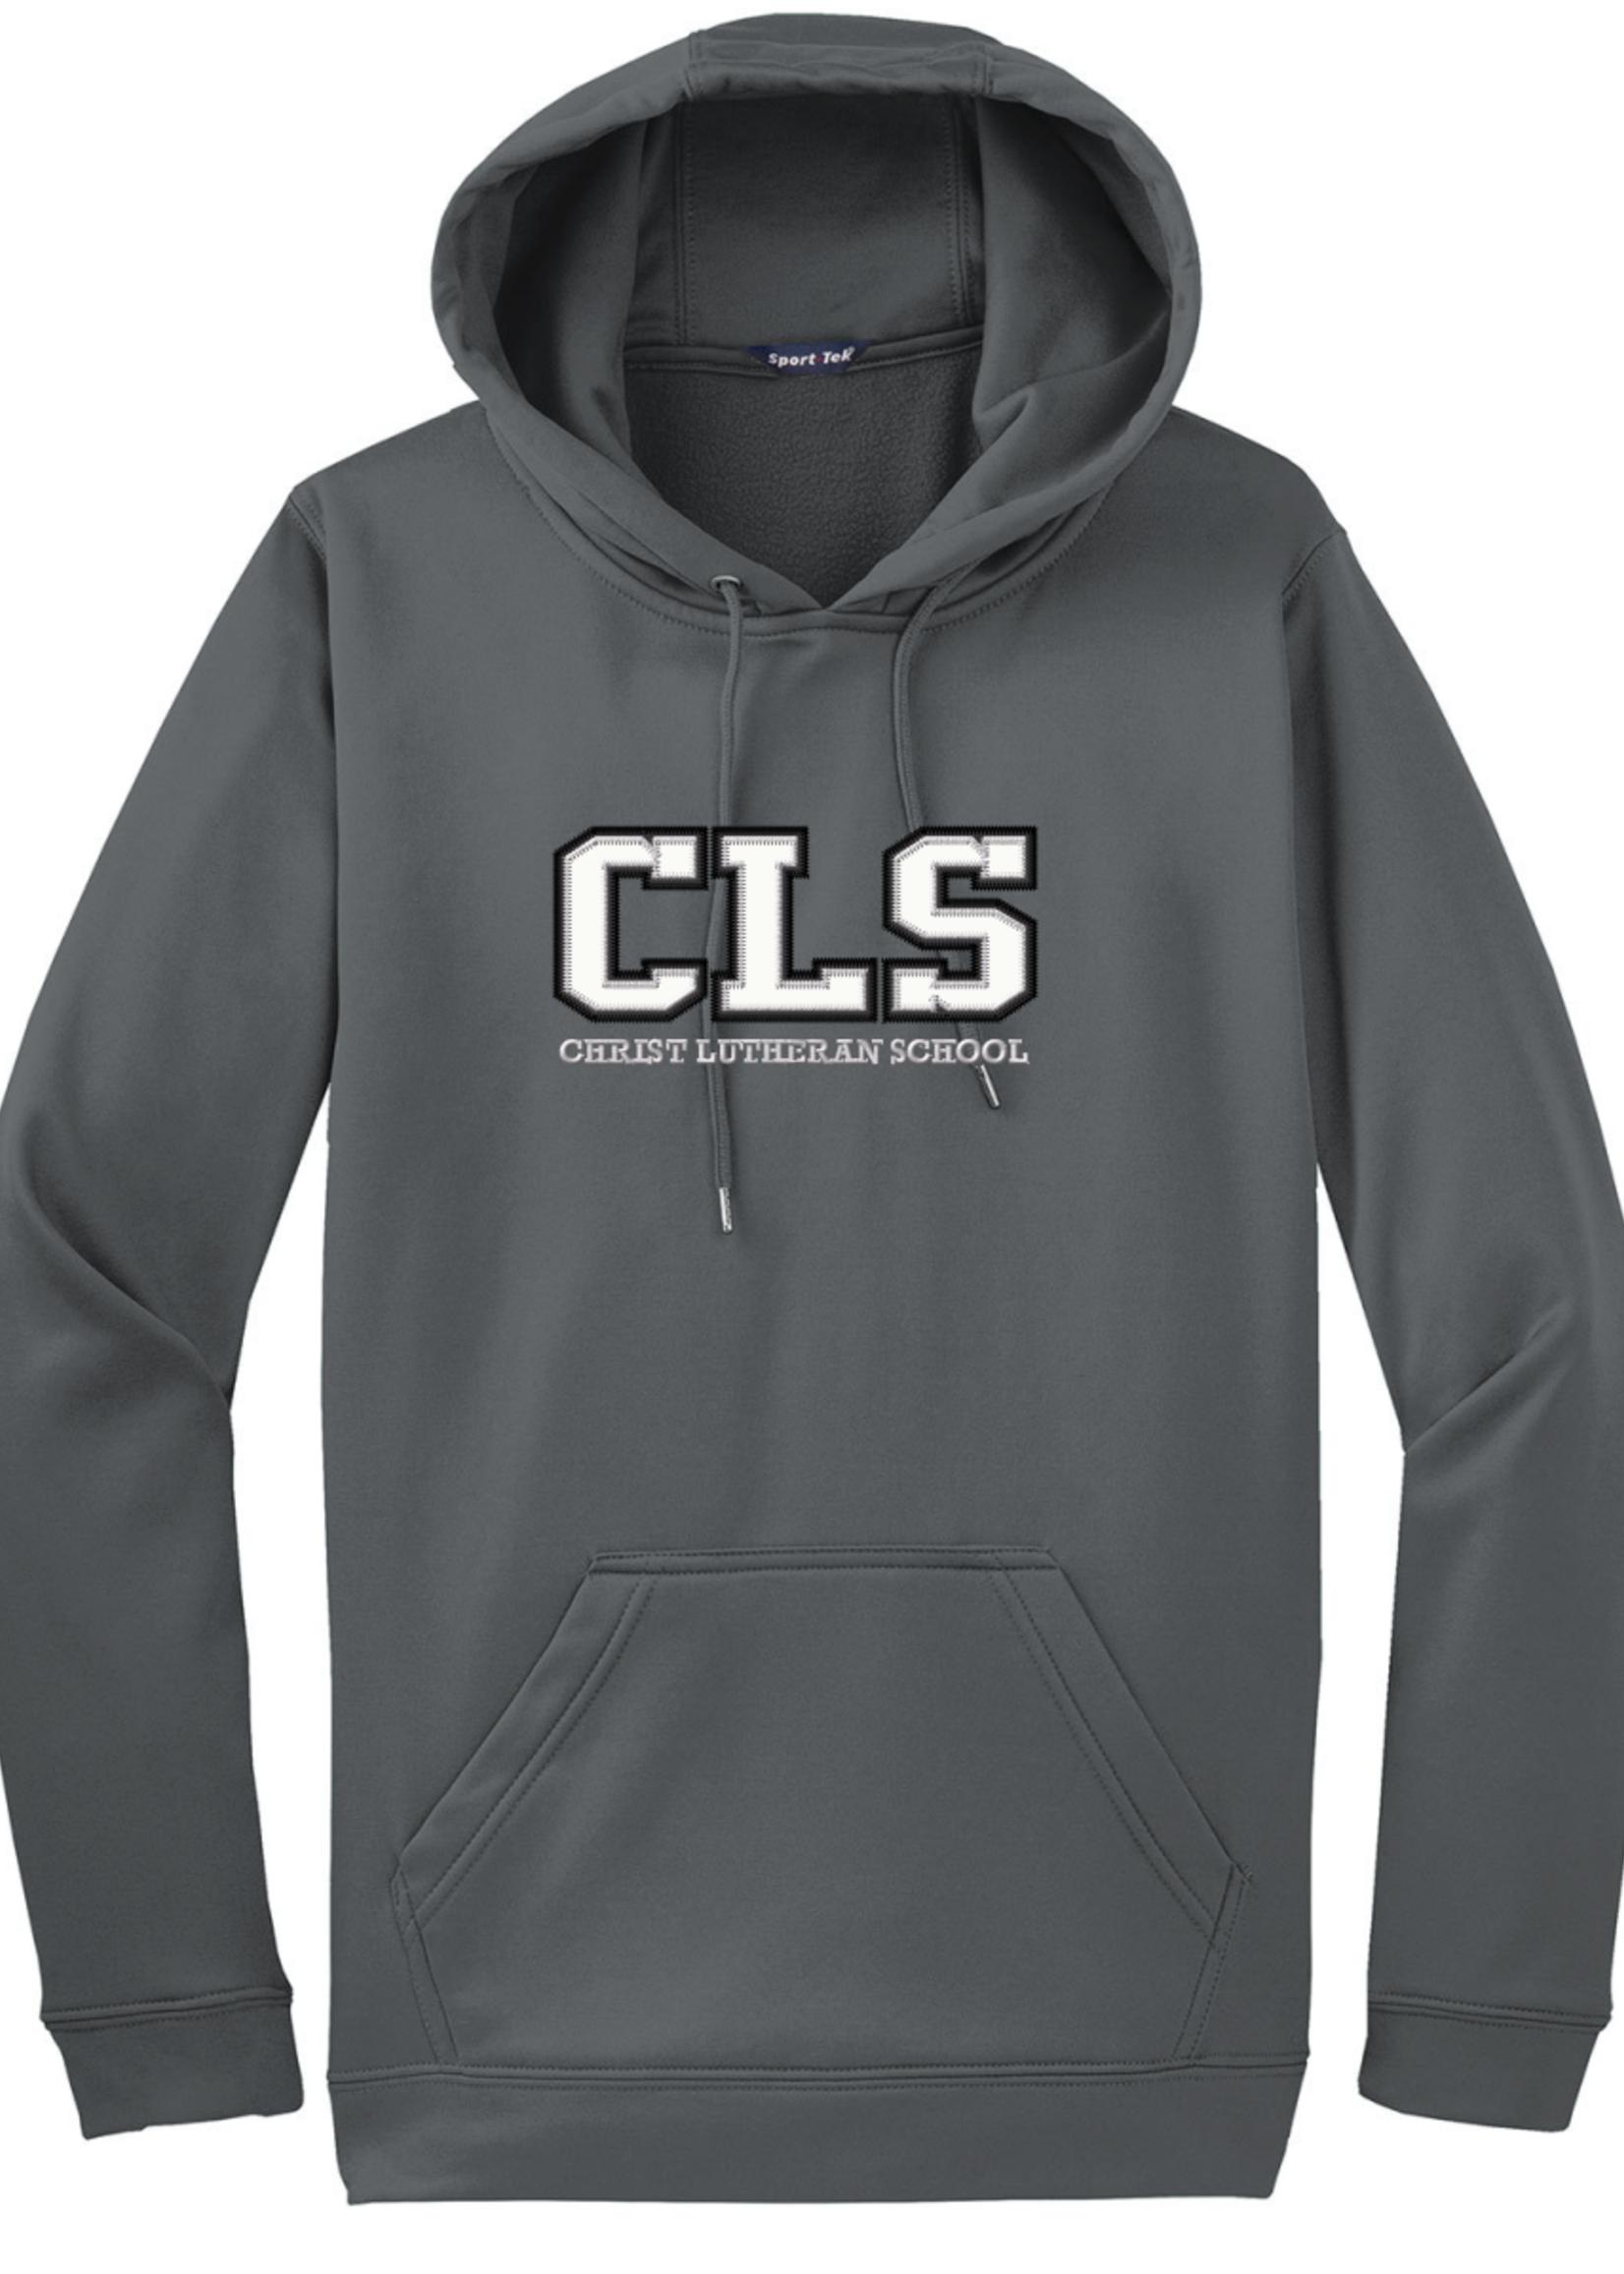 CLS Poly Tech Grey Hoodie Sweatshirt